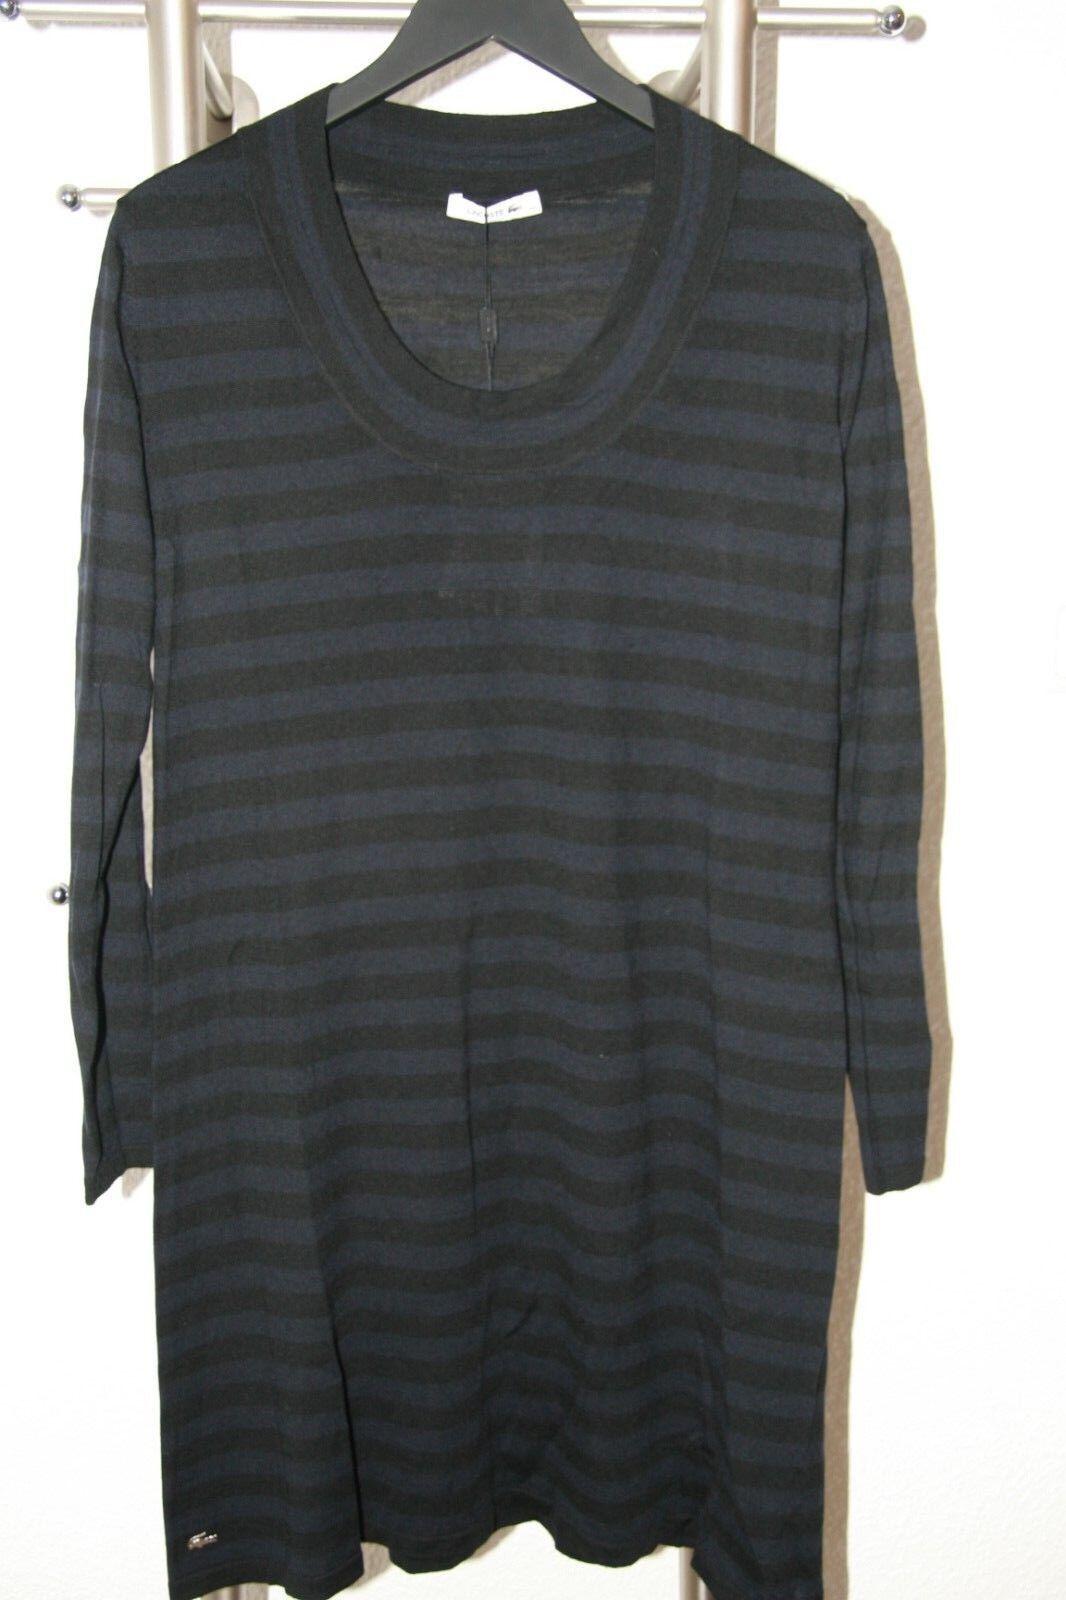 Lacoste Damen Kleid 42 - 44 blau - schwarz blau gestreift 100% Wolle NEU